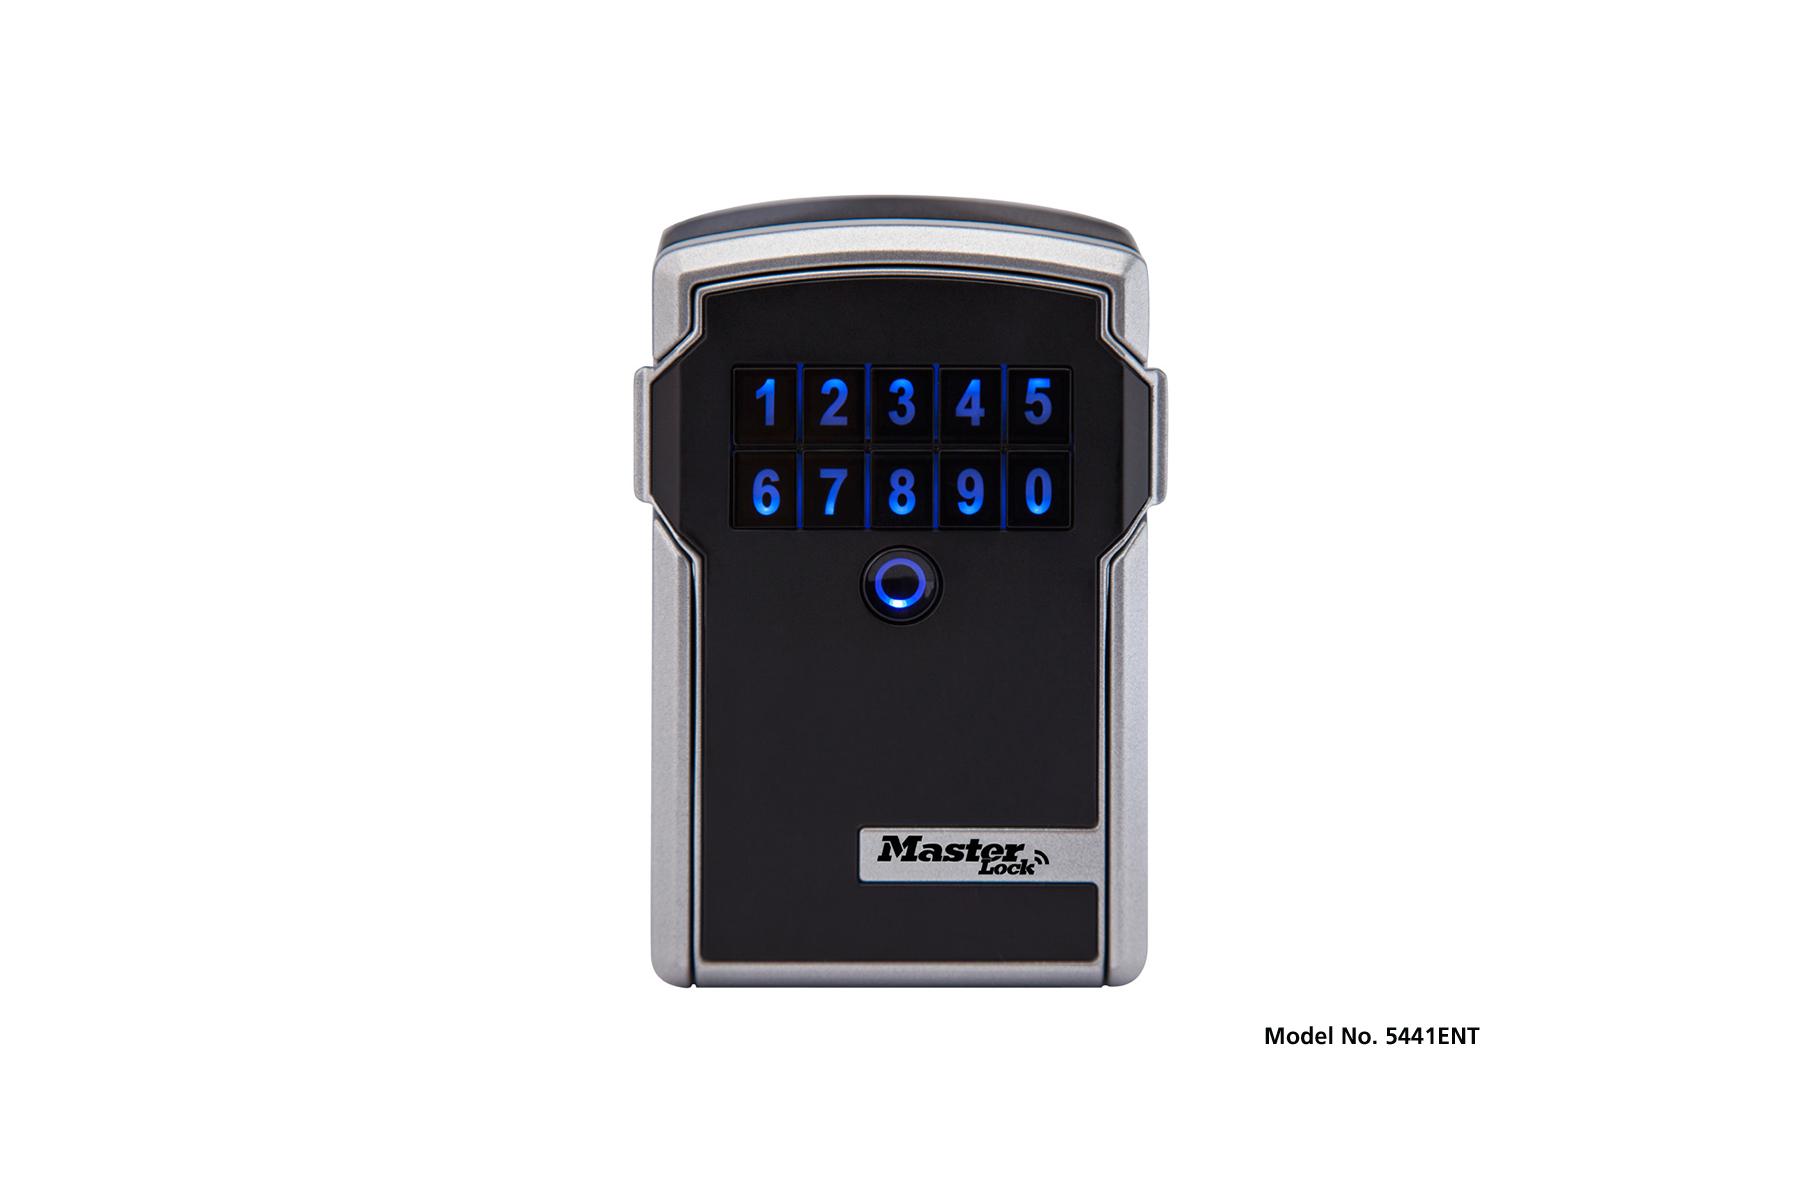 Master Lock Model No. 5441ENT